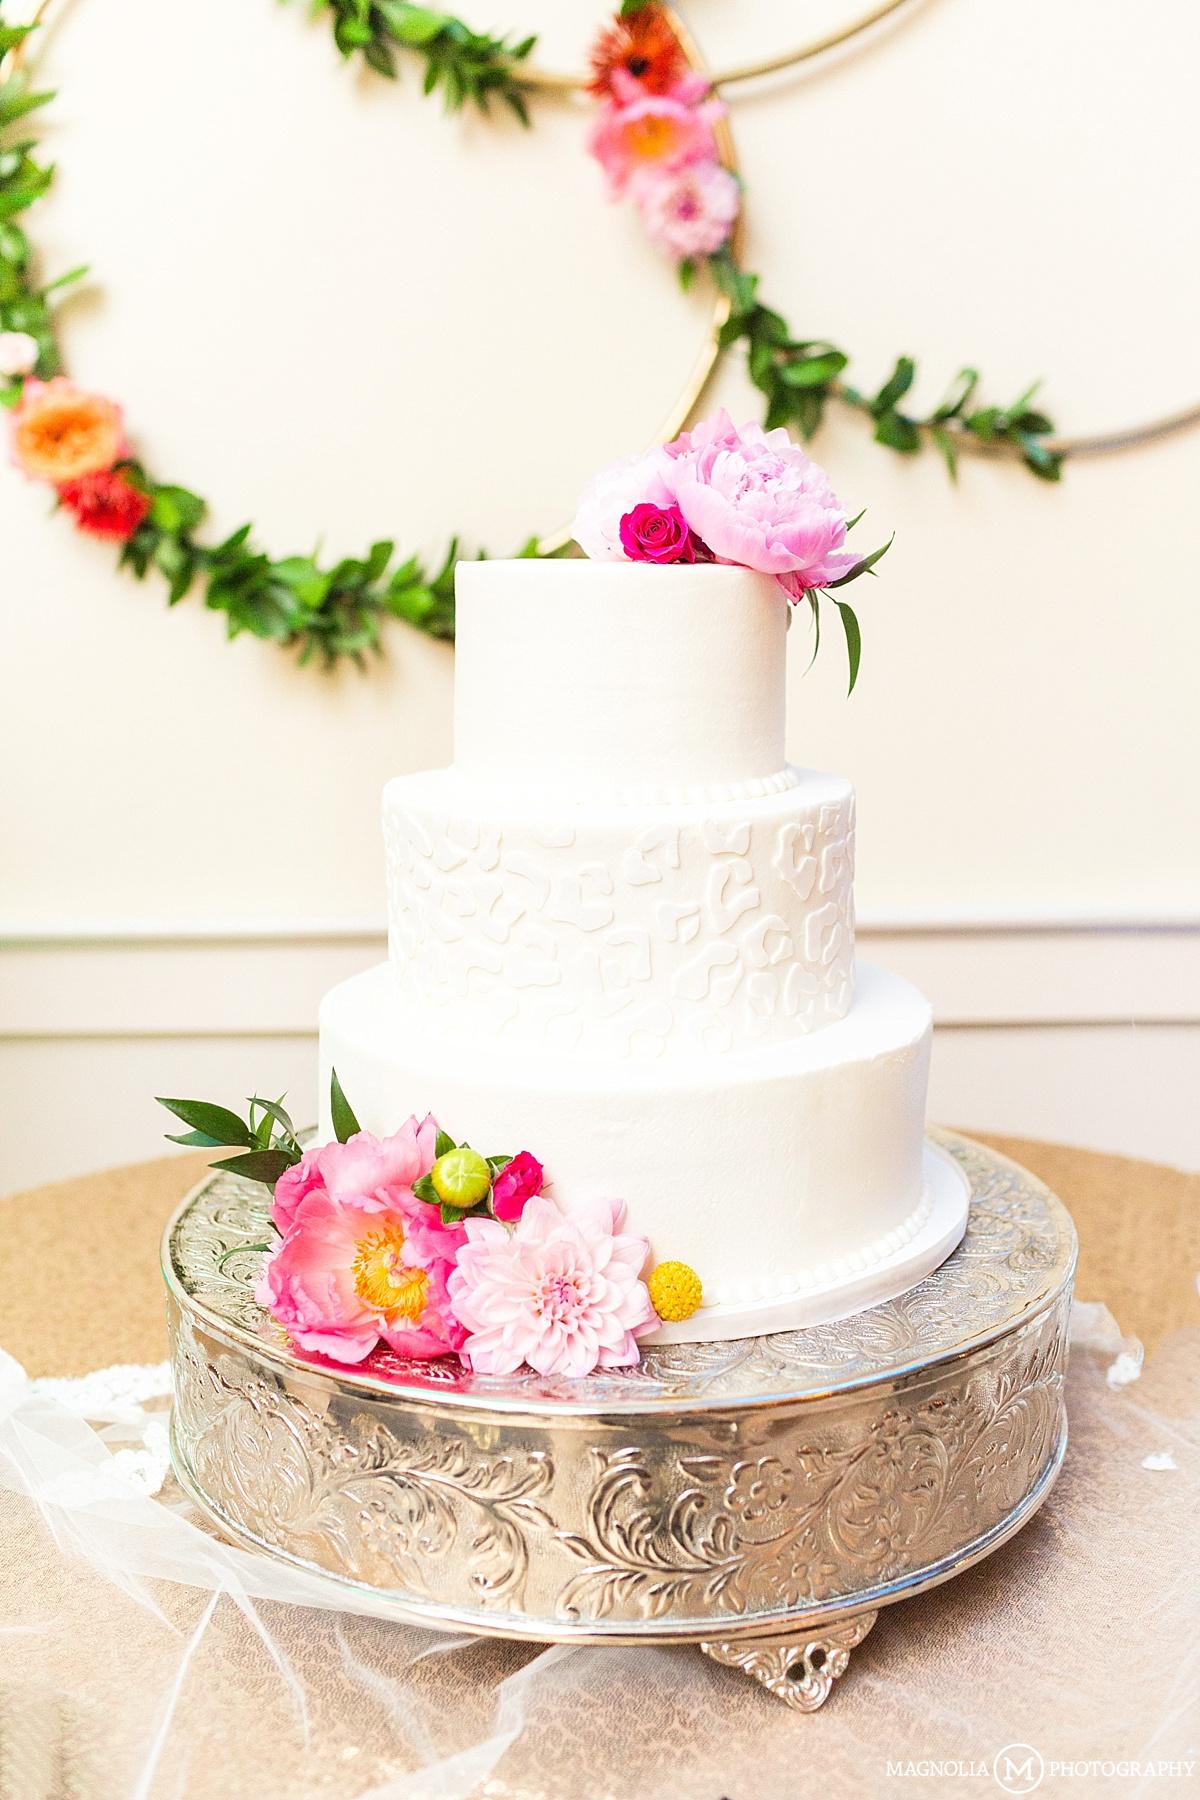 Weddings Incredible Edibles Bakery